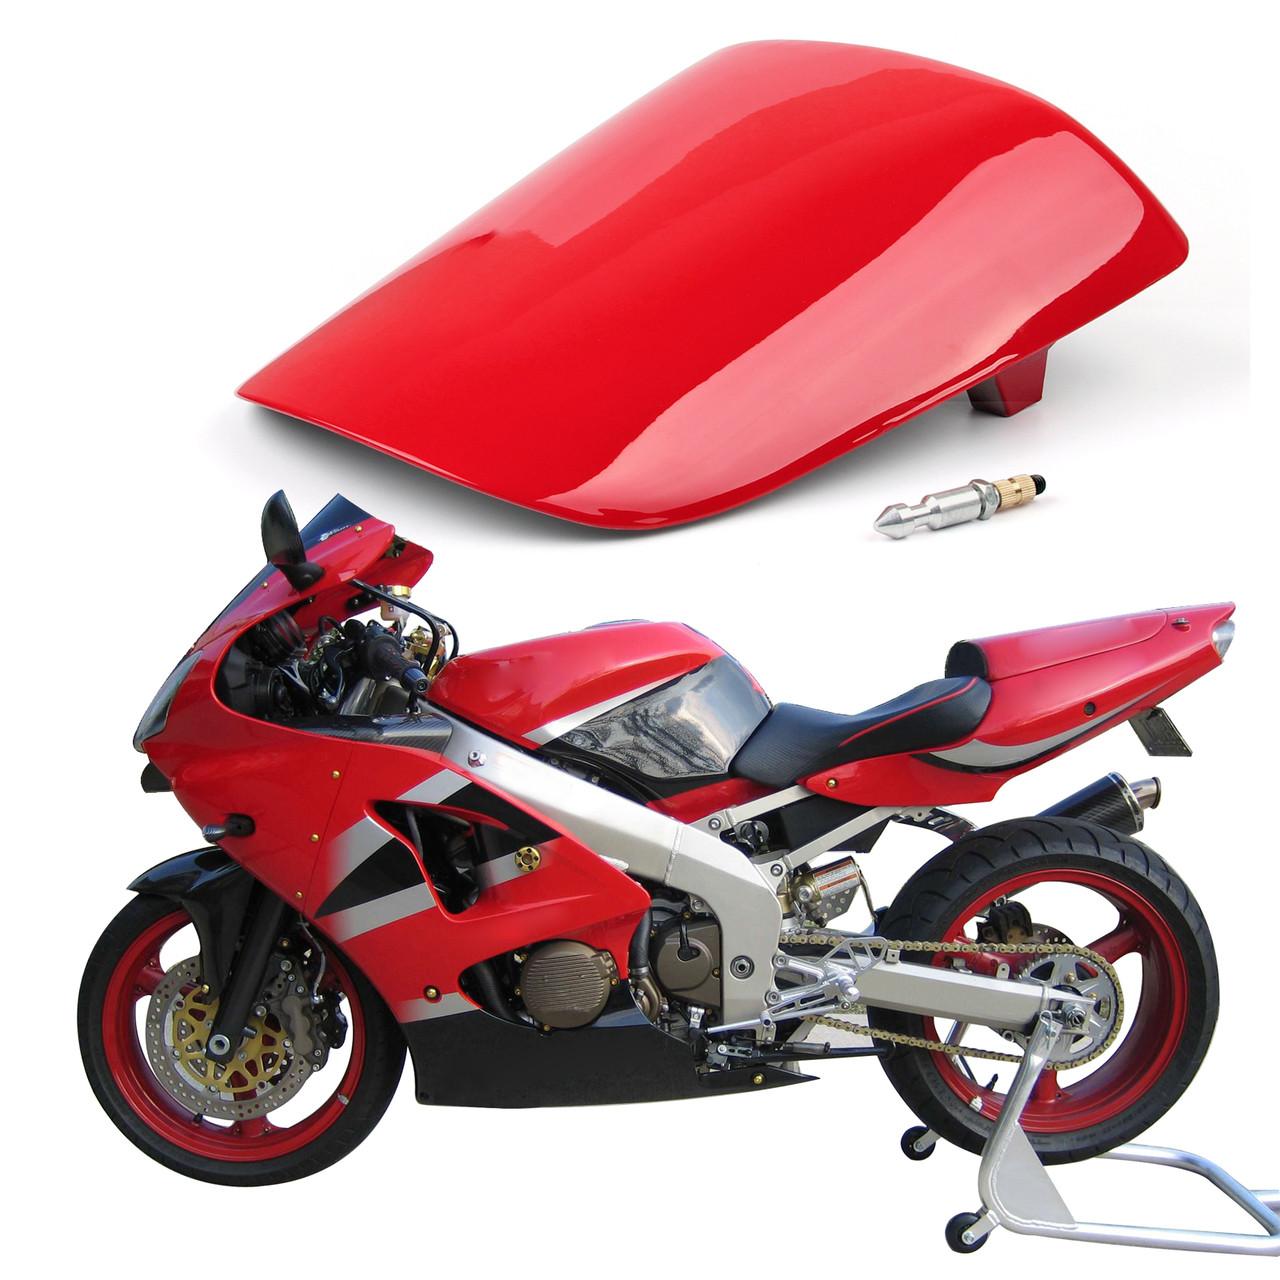 Motorcycle Black Rear Passenger Cushion Rear Pillion Seat Cowls For Kawasaki ZX6R 1998-2002 ZZR600 2005-2008